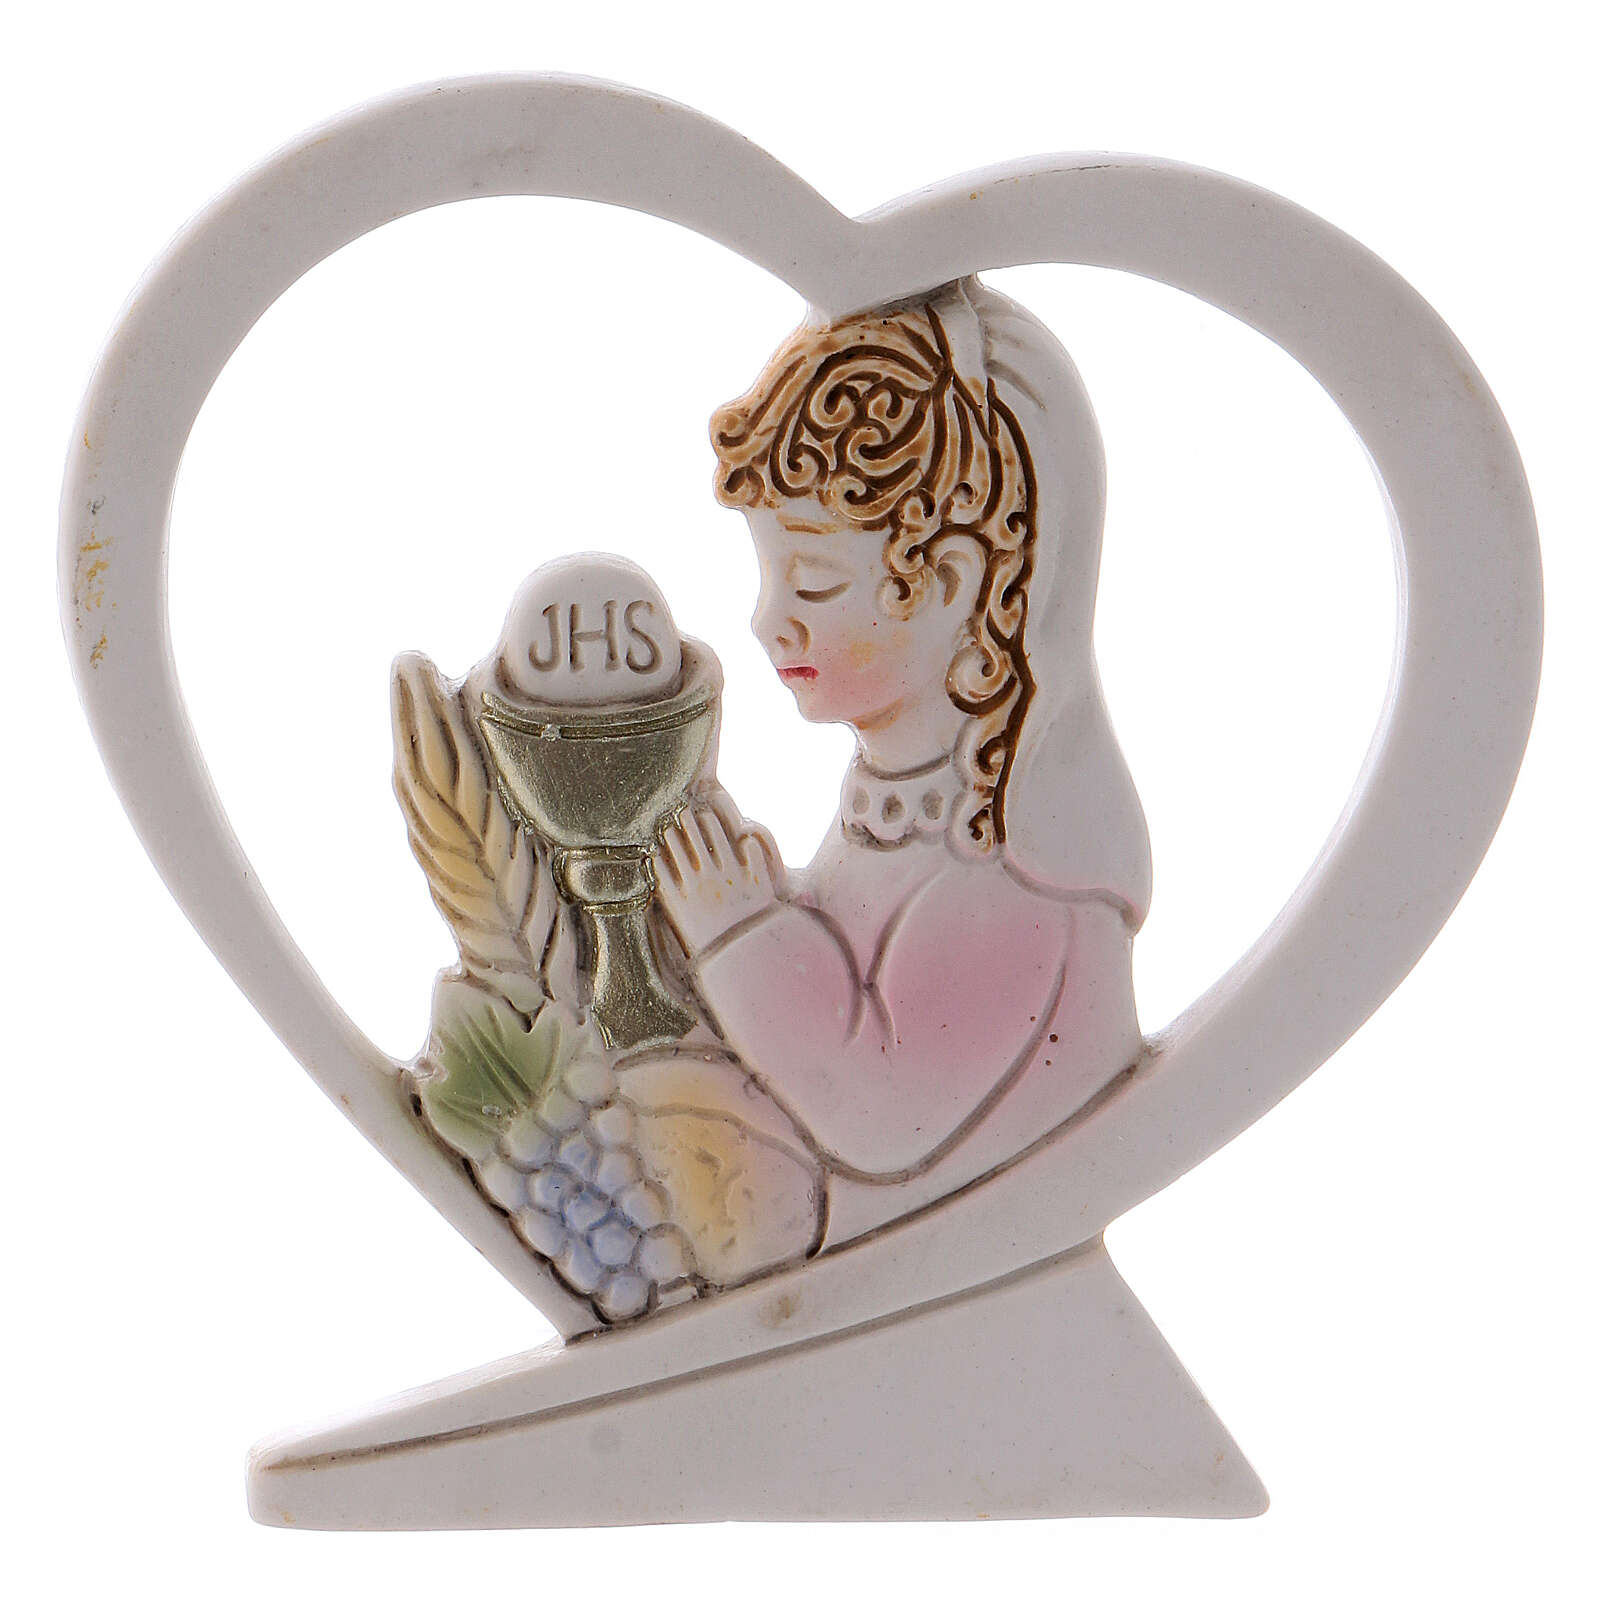 Heart shaped standing ornament girl praying resin 2.5 in 3